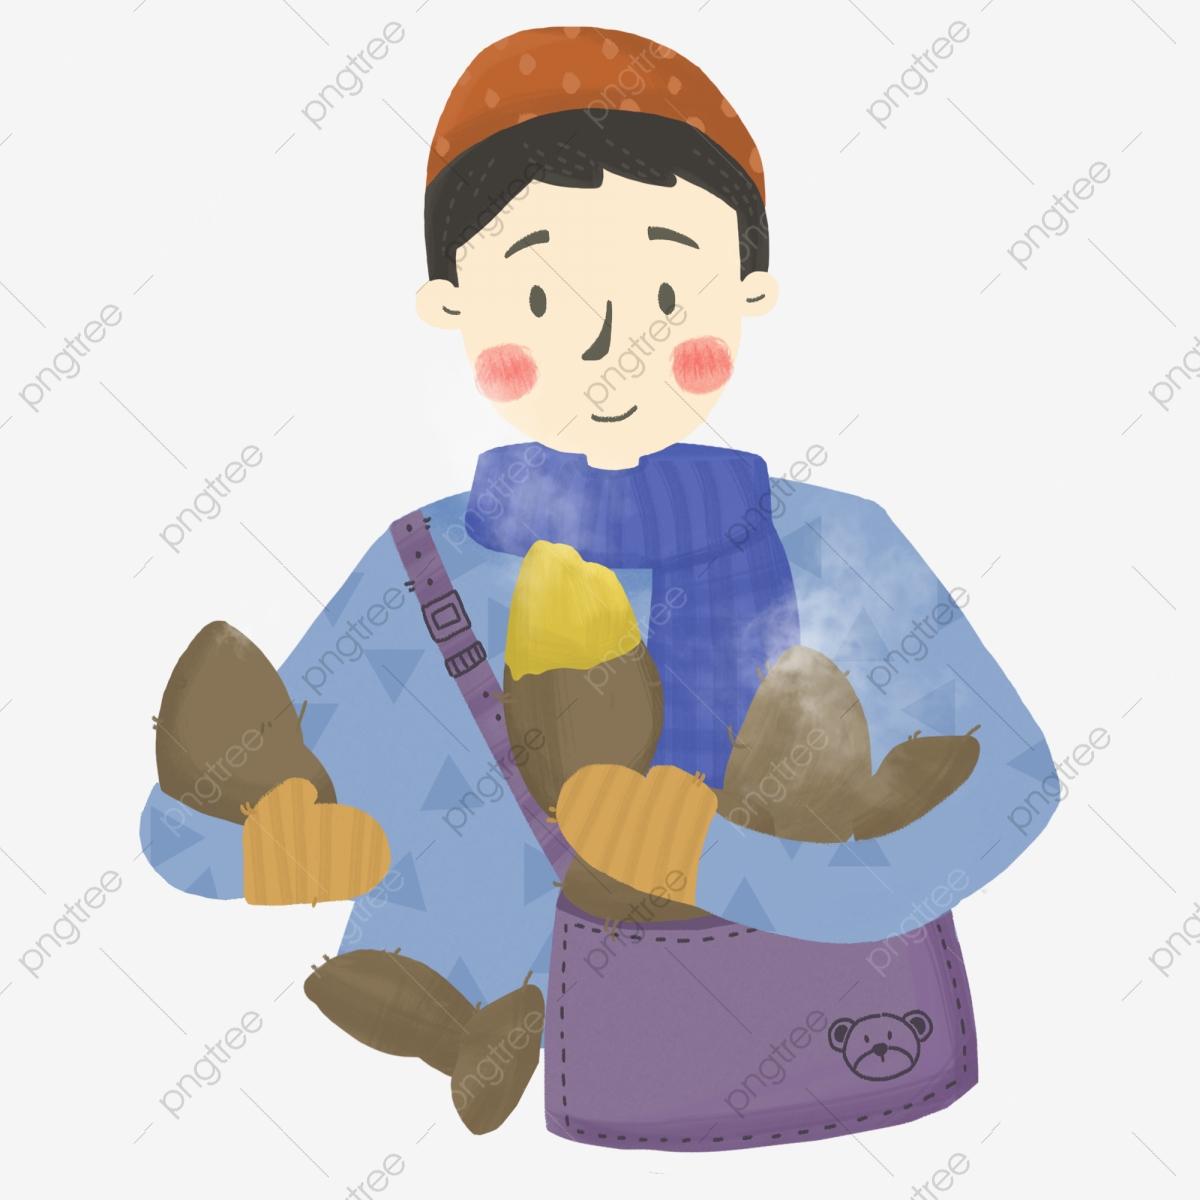 Cartoon hand drawn boy. Clipart winter person